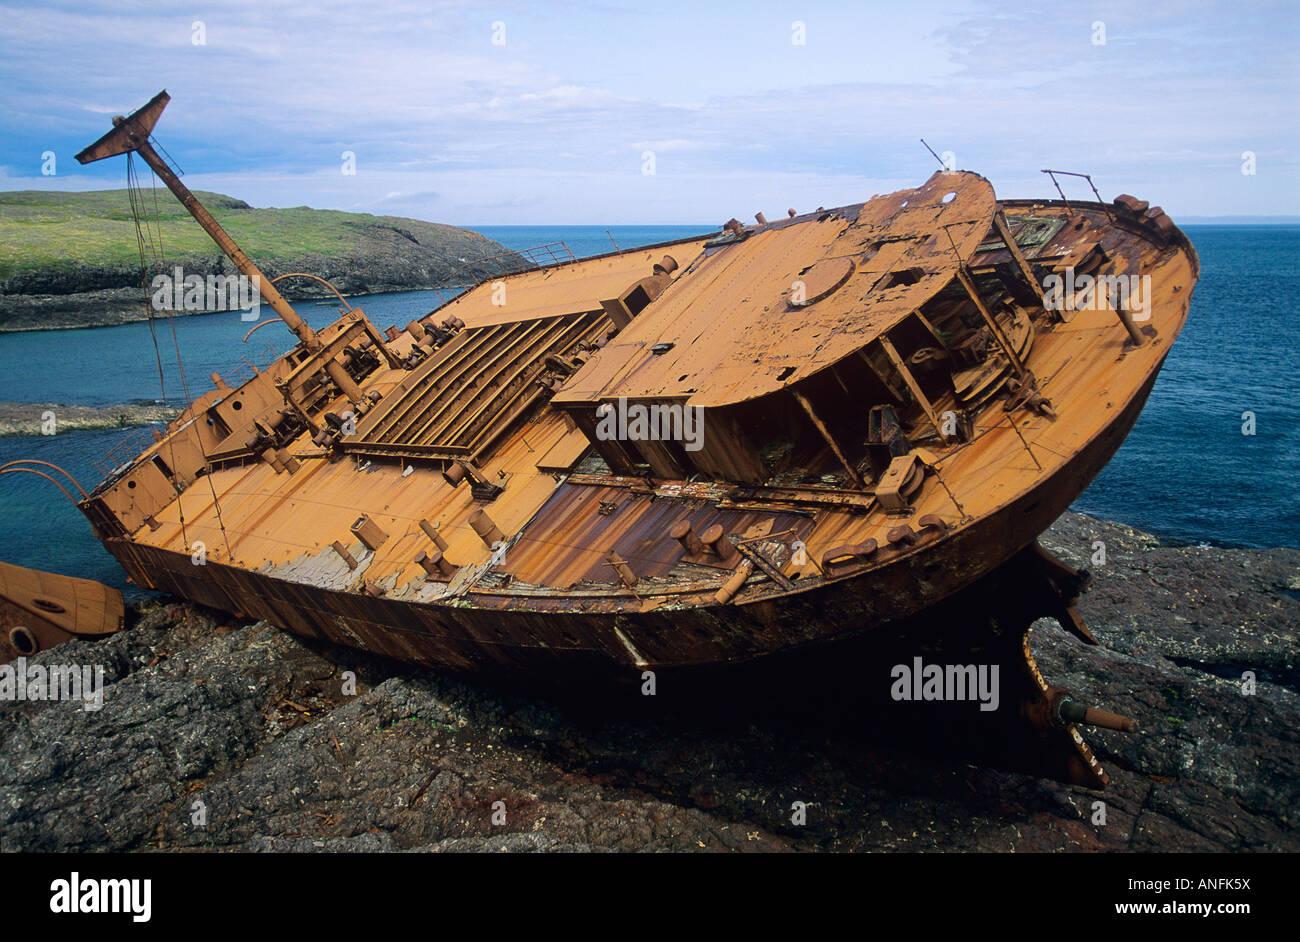 shipwreck off the coast of newfoundland, Canada. - Stock Image